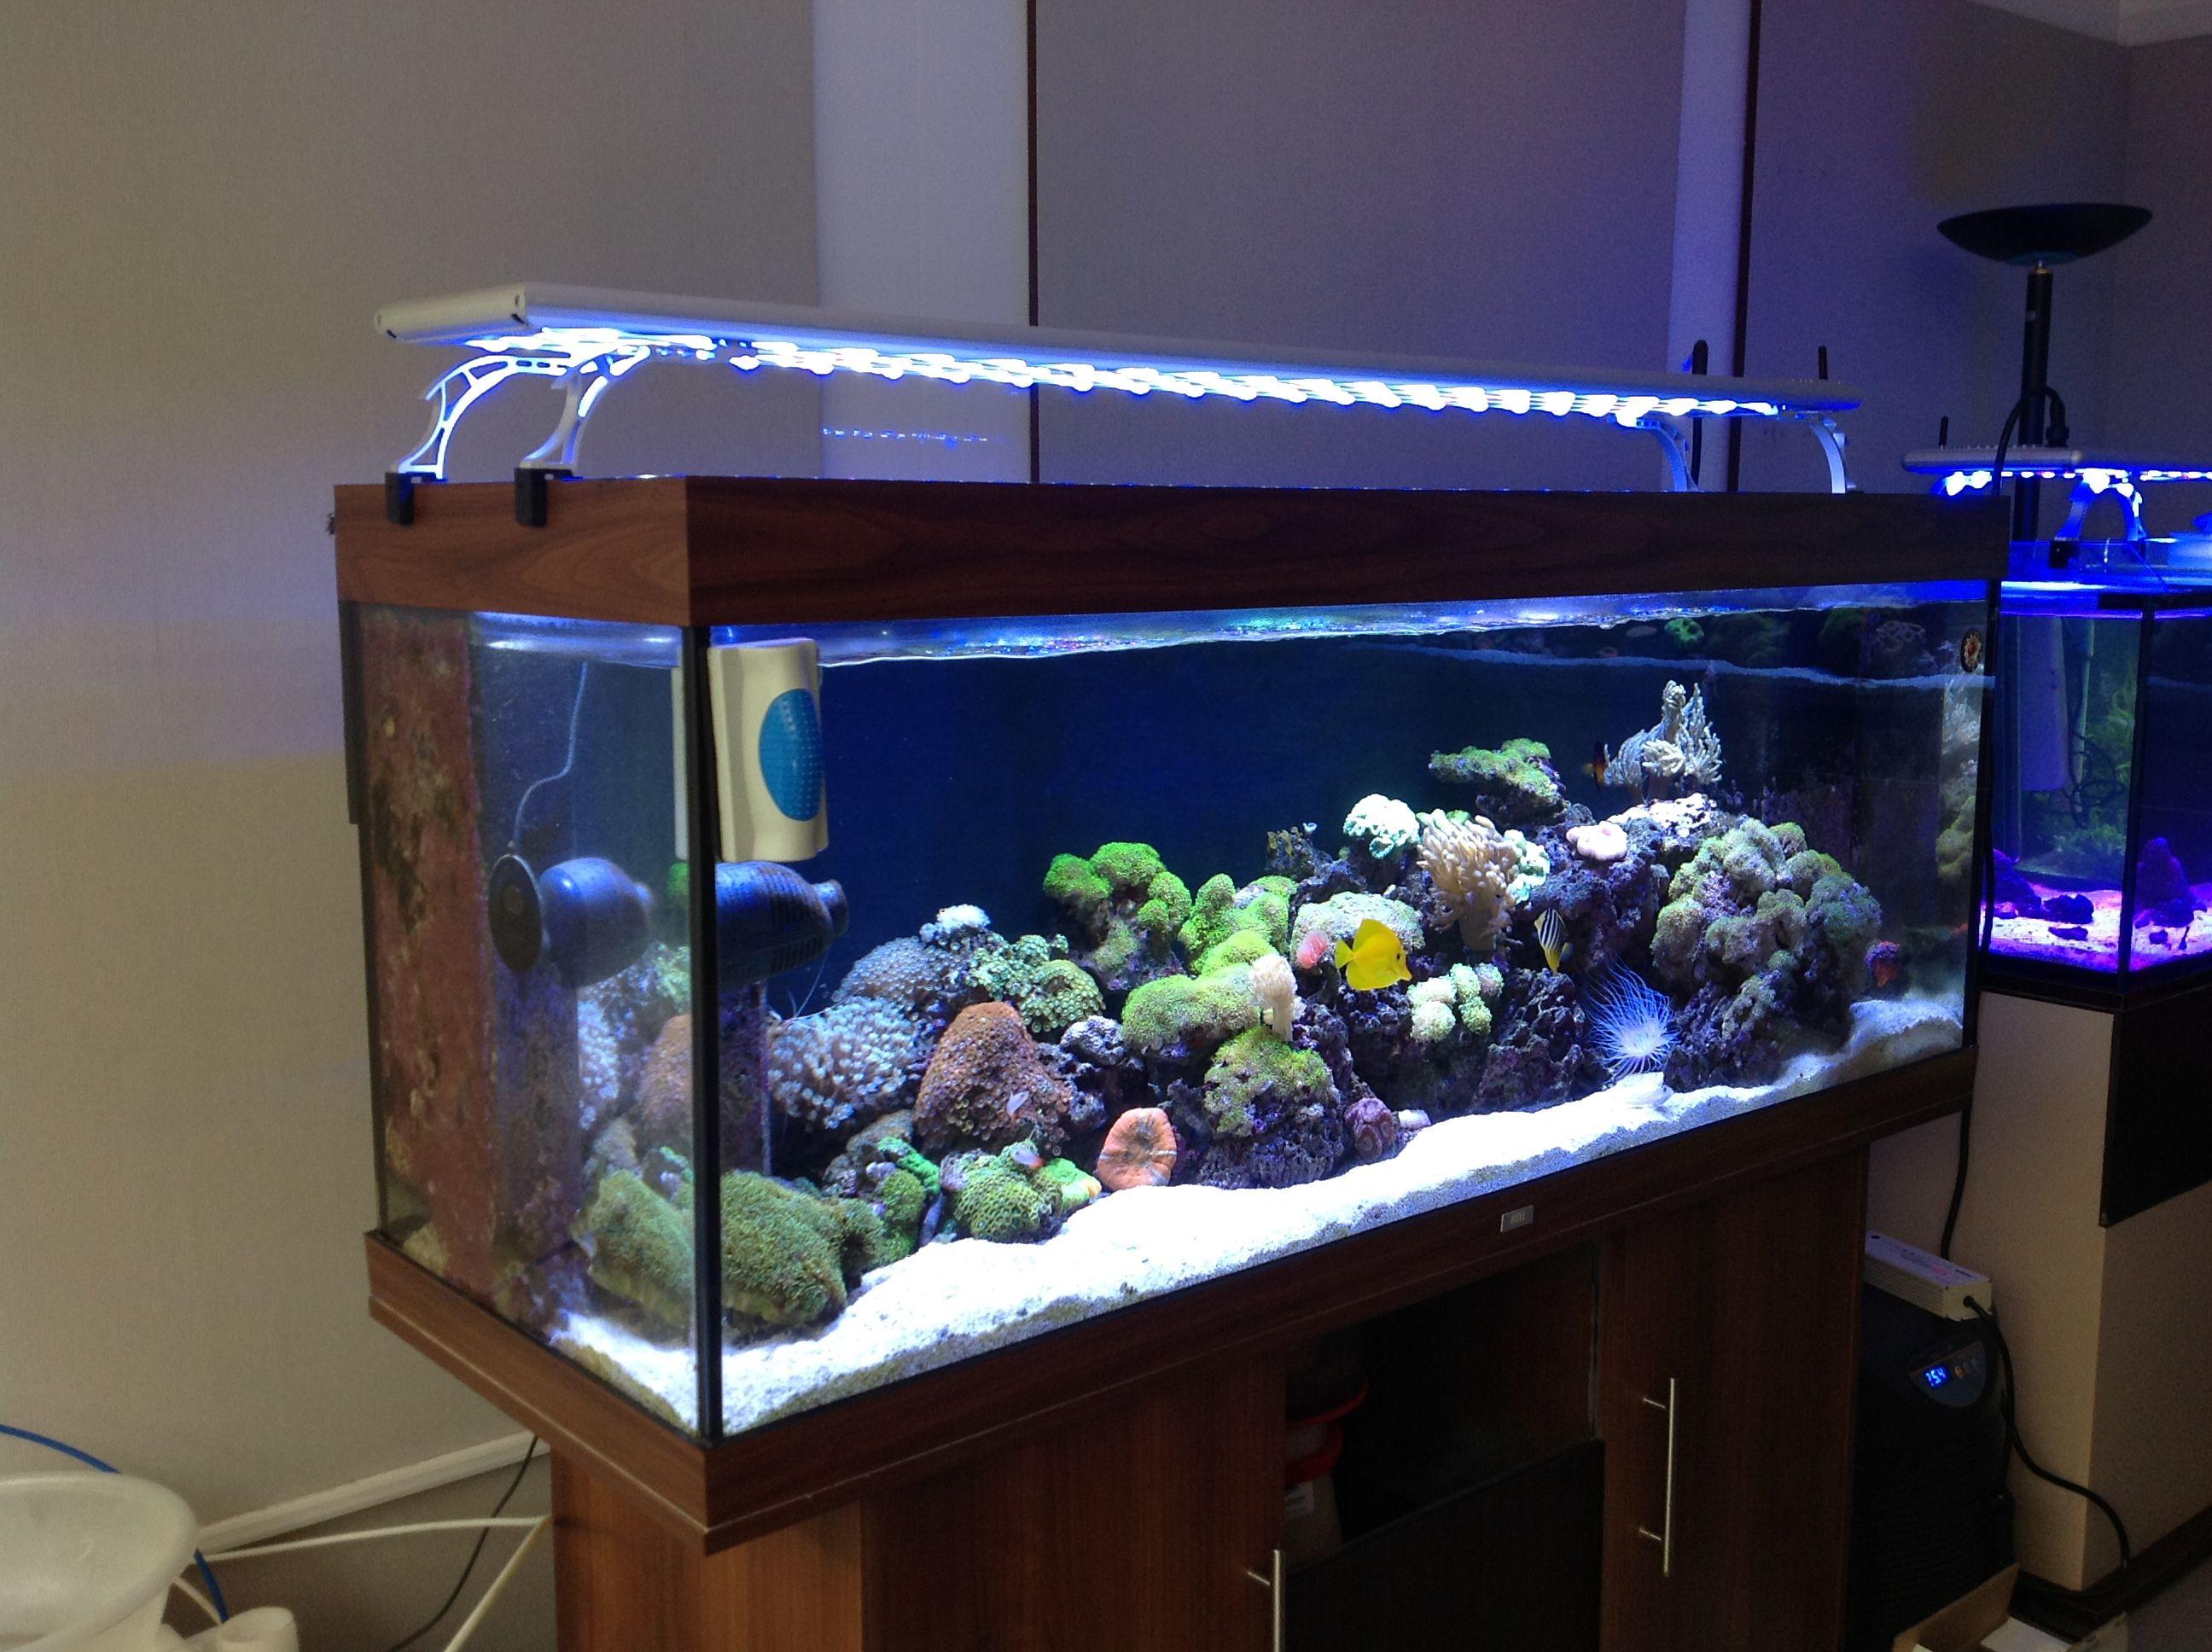 ideas meganraley hanging light aquarium diy kit stand